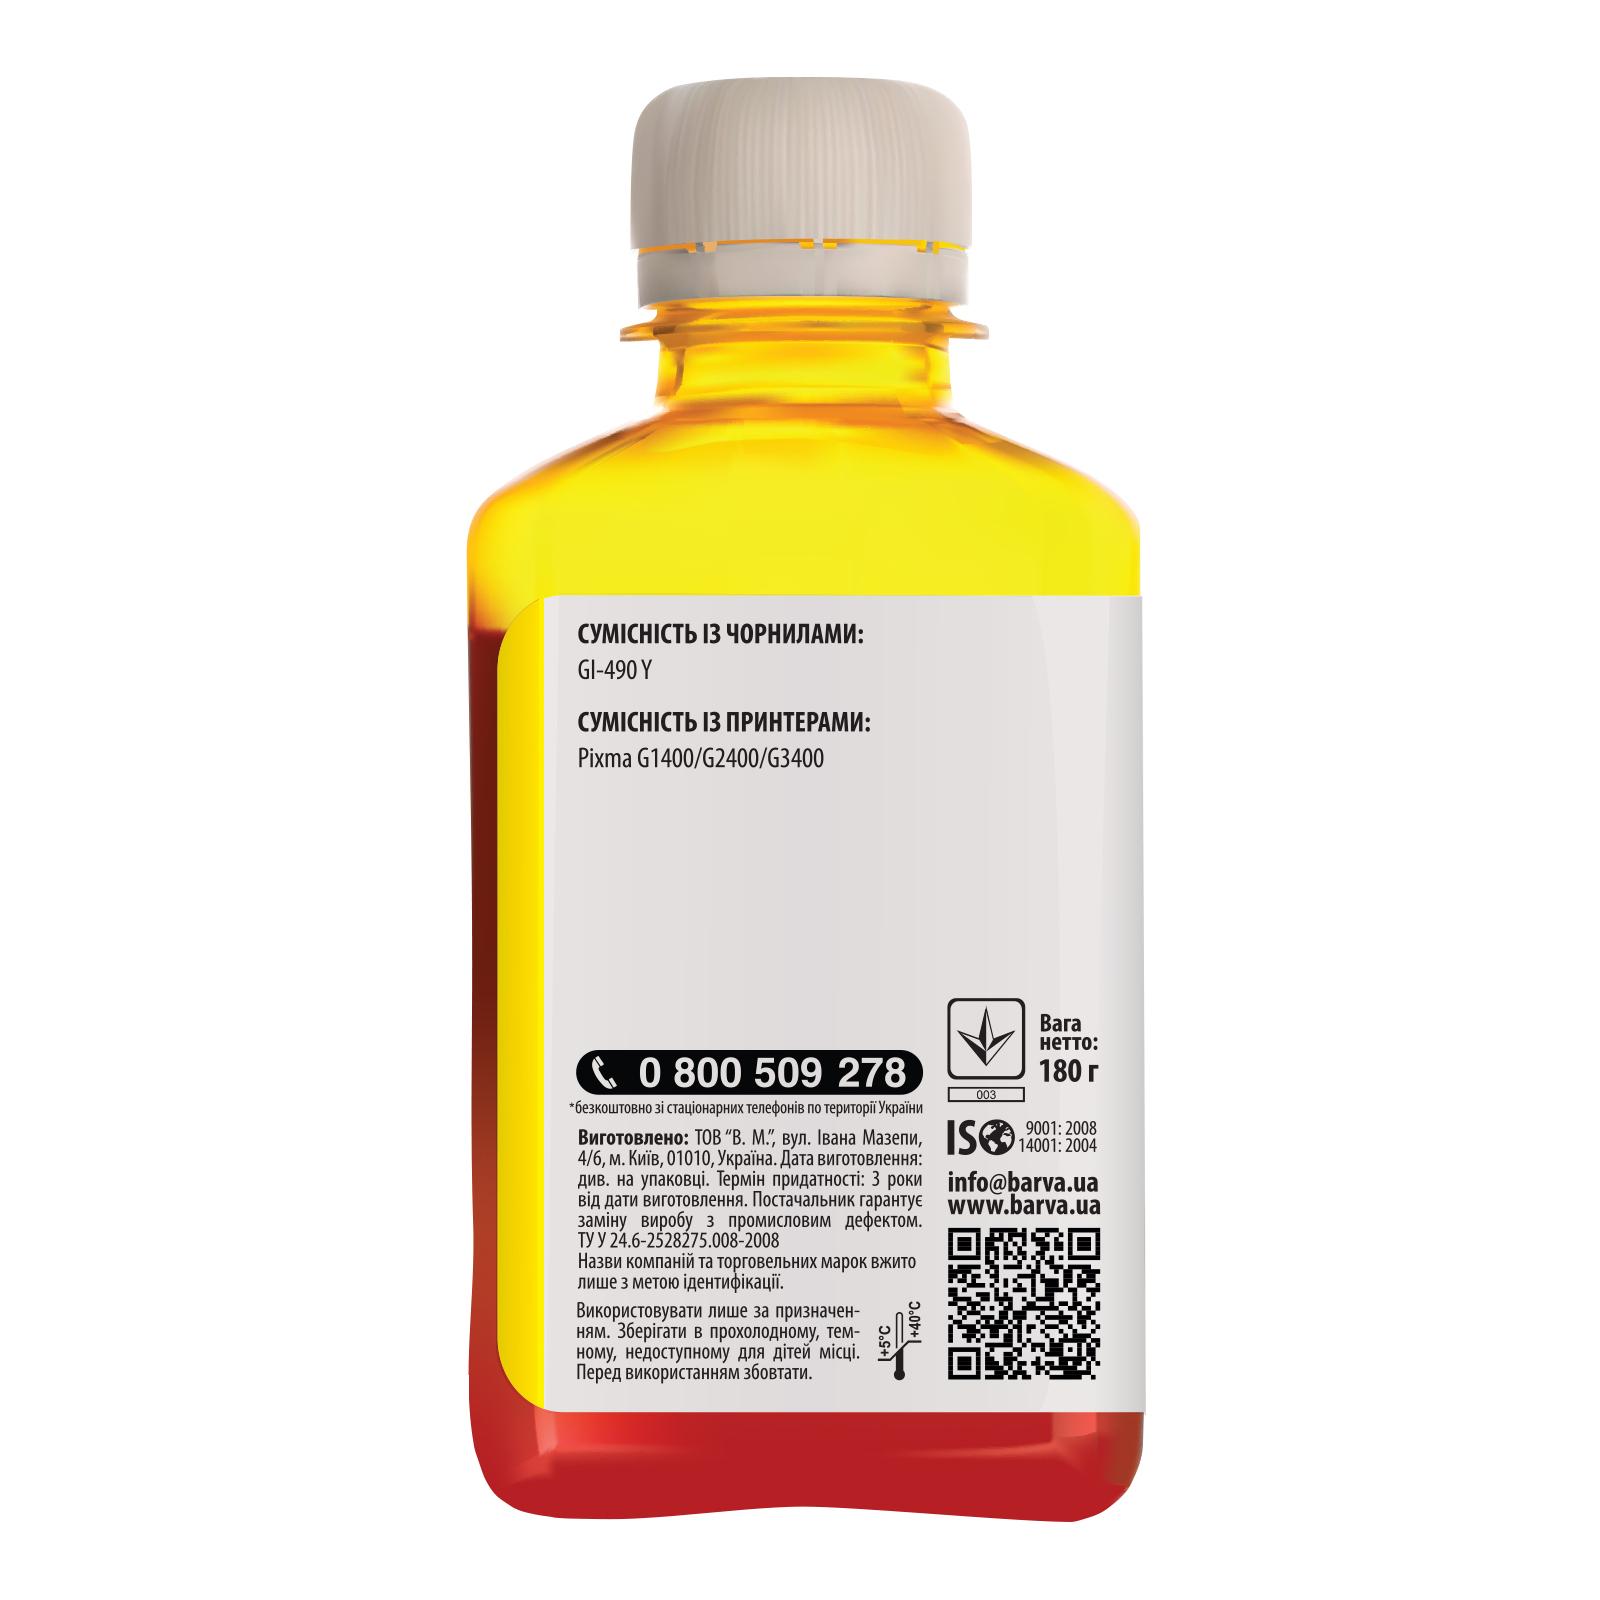 Чернила Barva CANON GI-490 180г YELLOW (G490-506) изображение 2